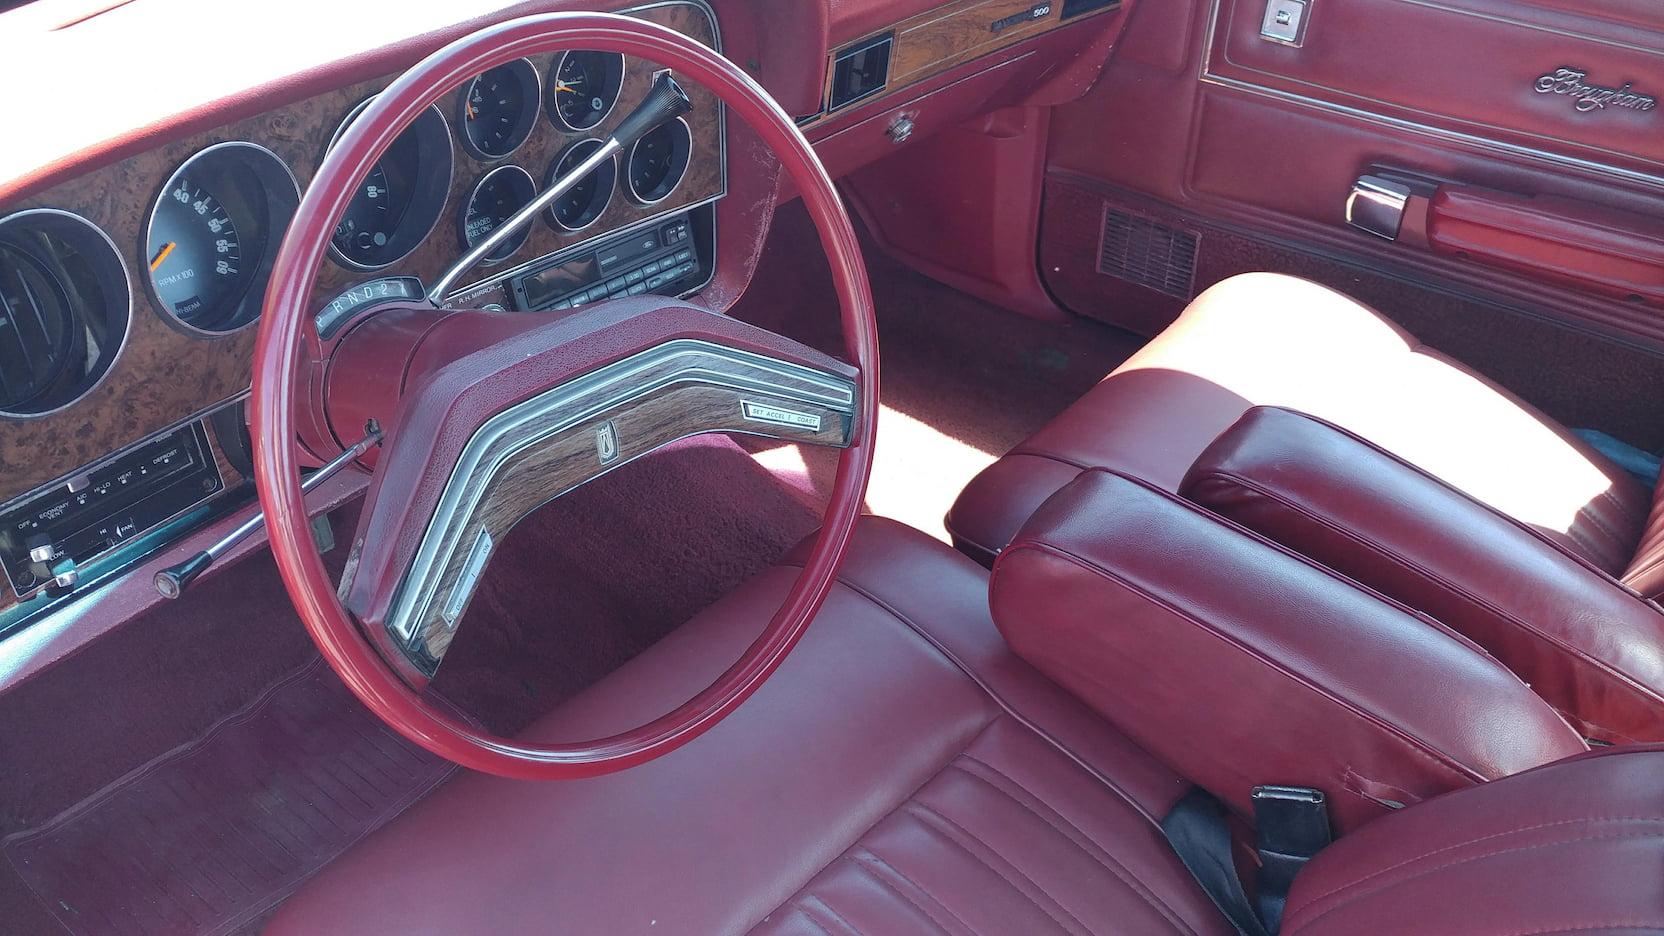 1979 Ford Ranchero interior